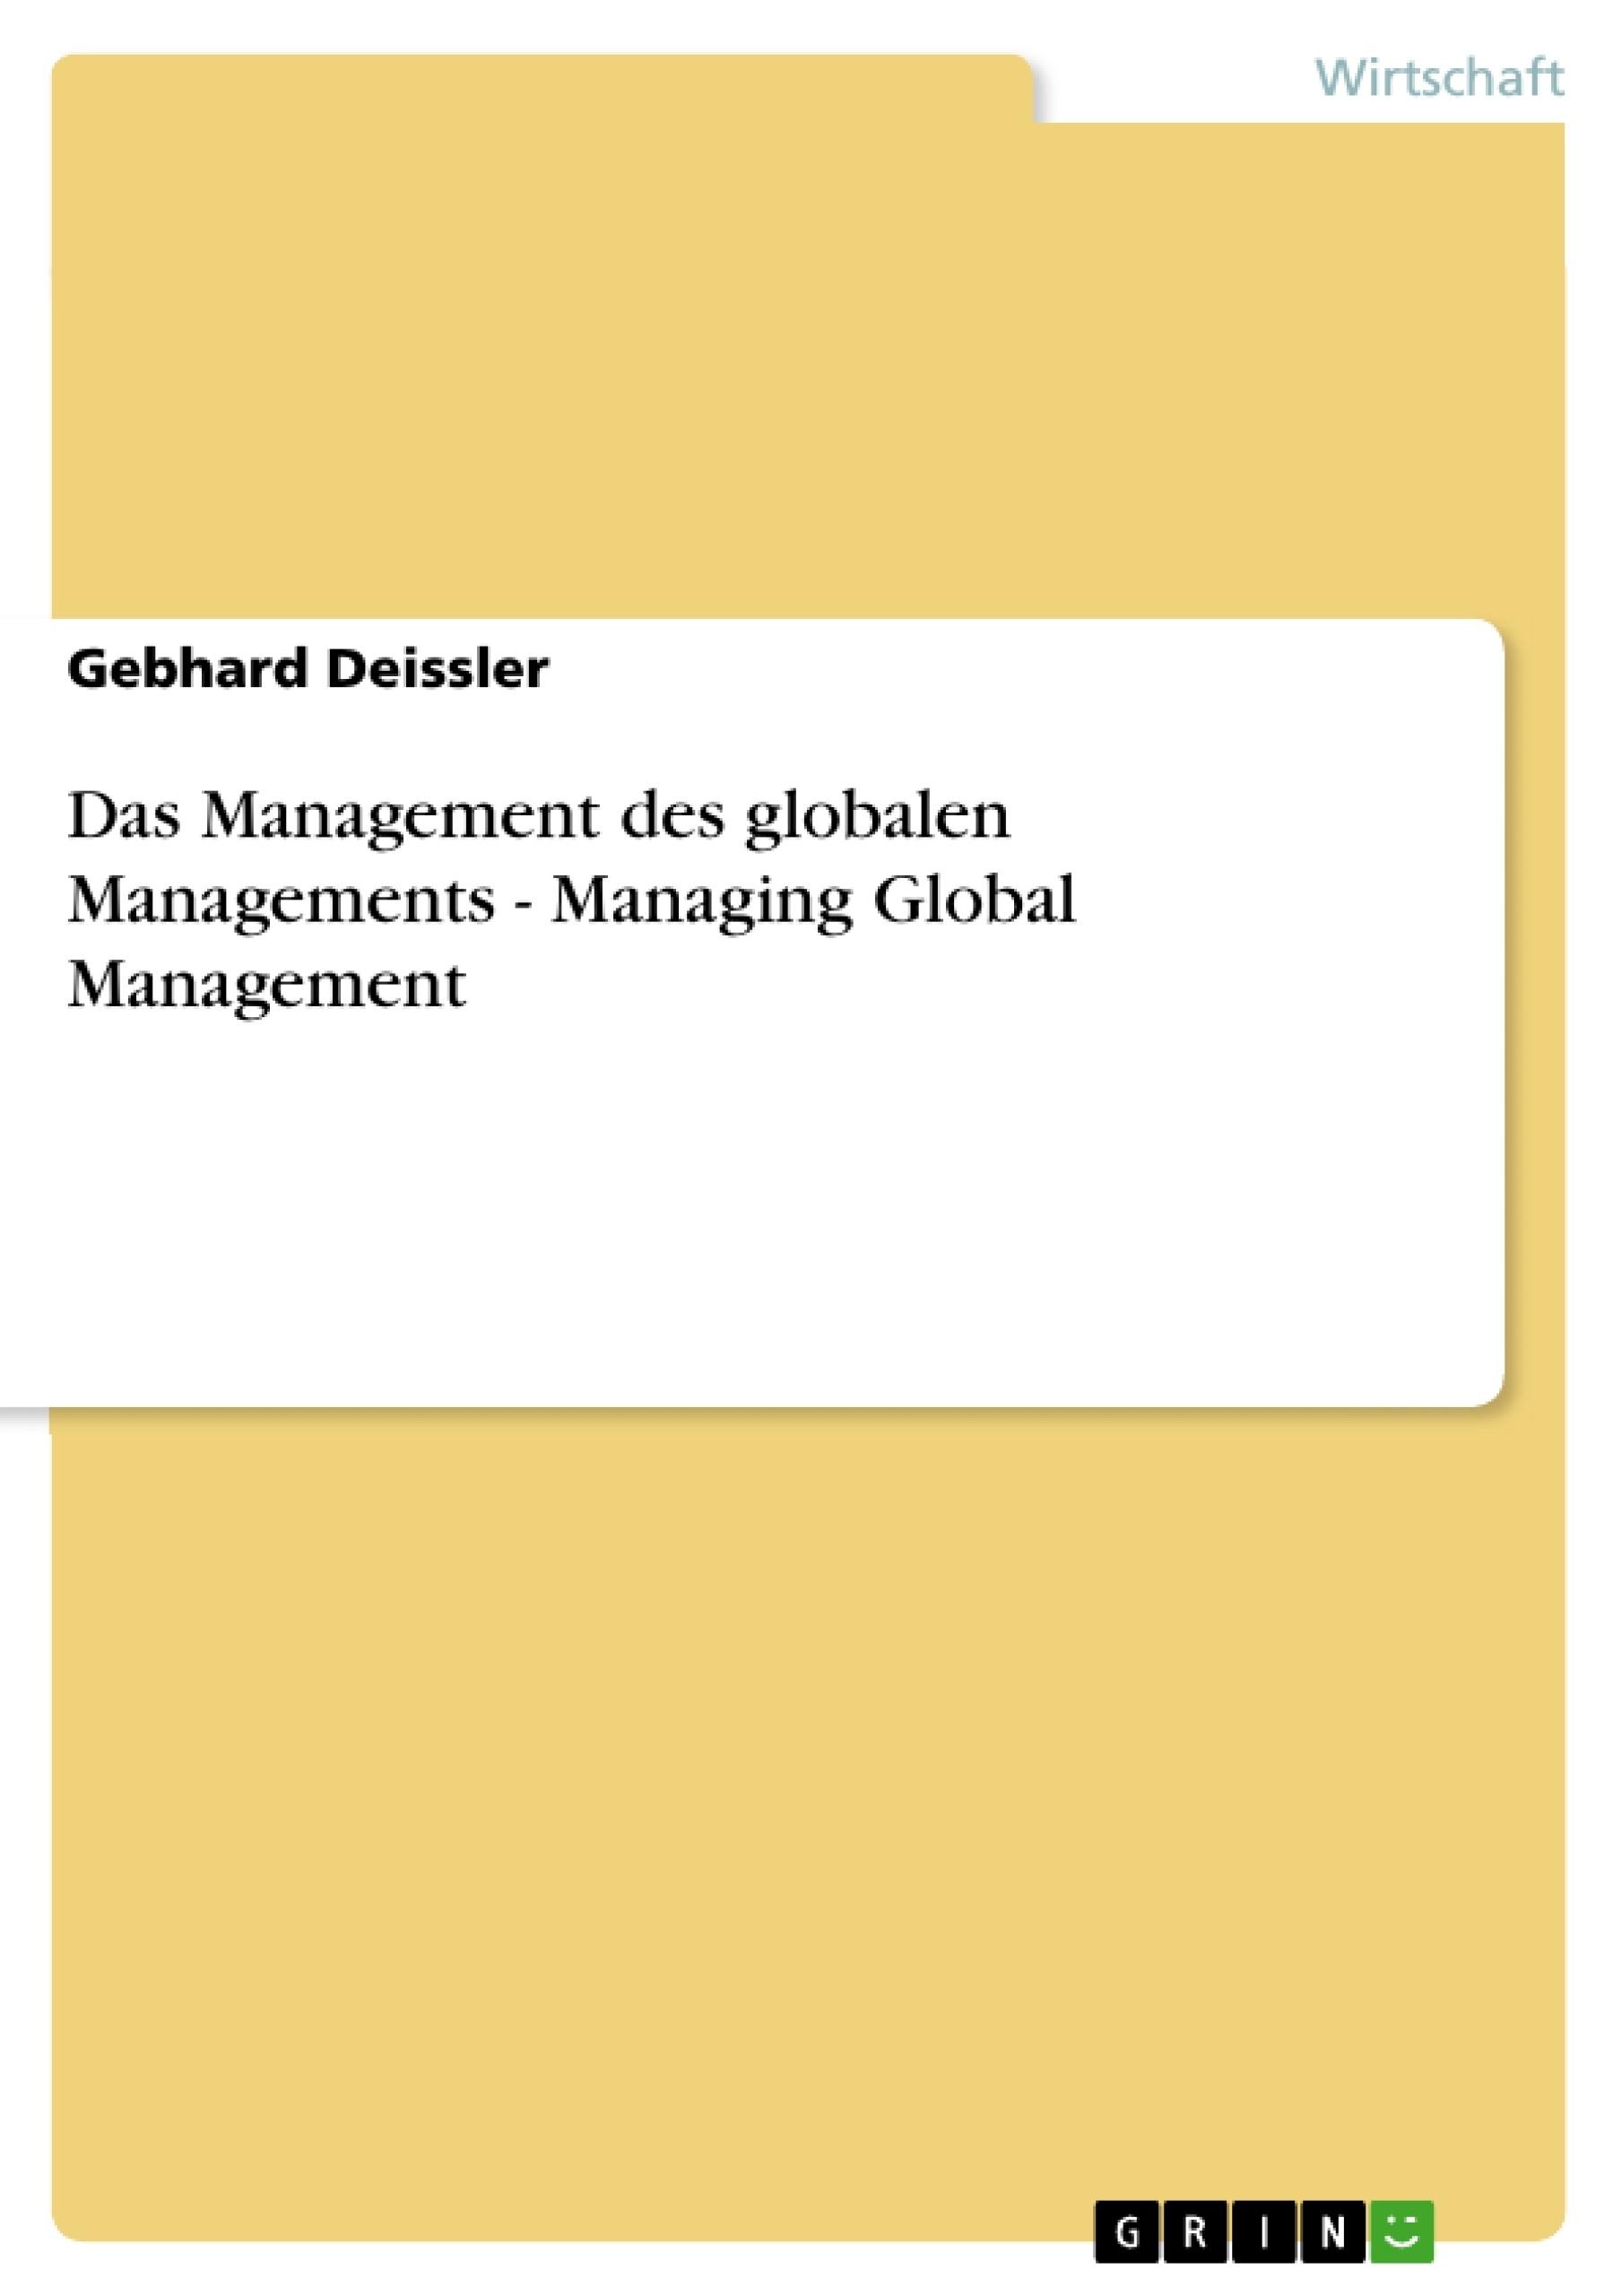 Titel: Das Management des globalen Managements - Managing Global Management